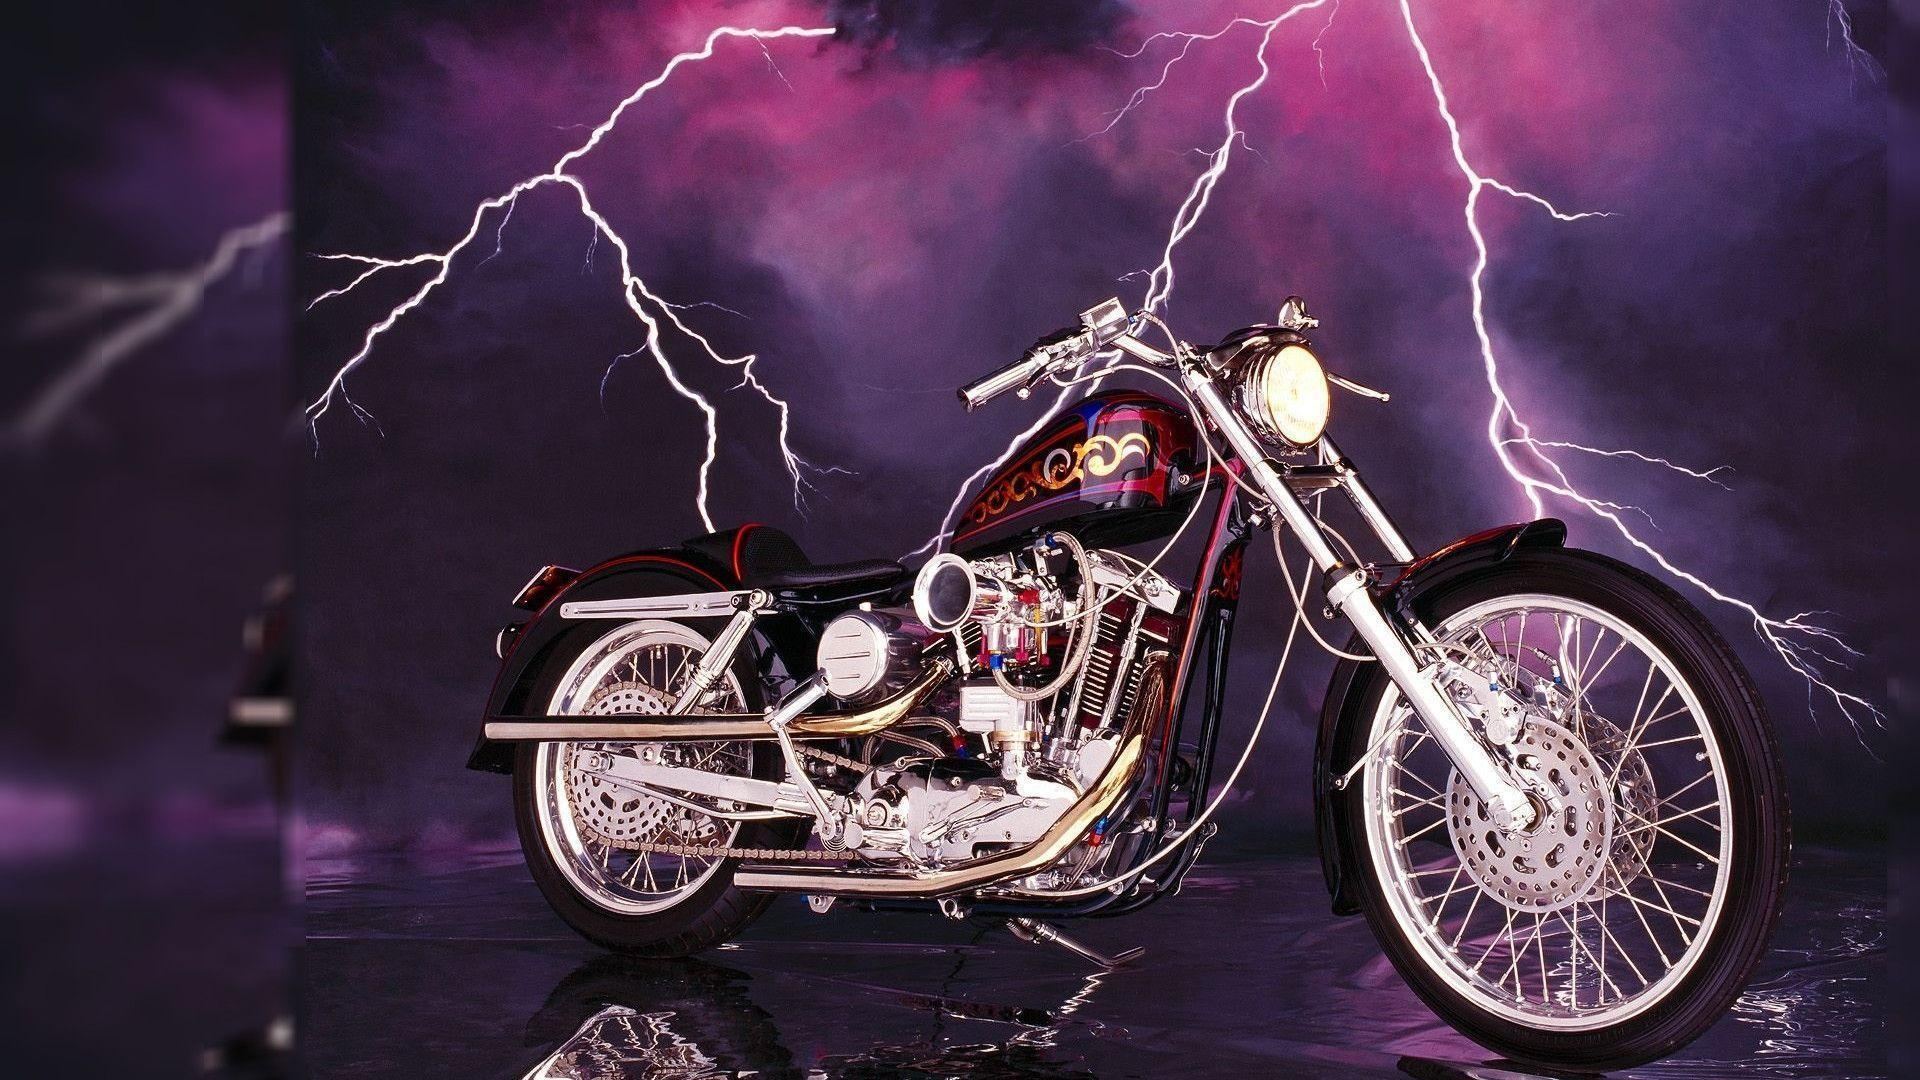 Harley Davidson Wallpapers Hd Best Bikes Pictures By Atit: Harley Davidson Desktop Backgrounds